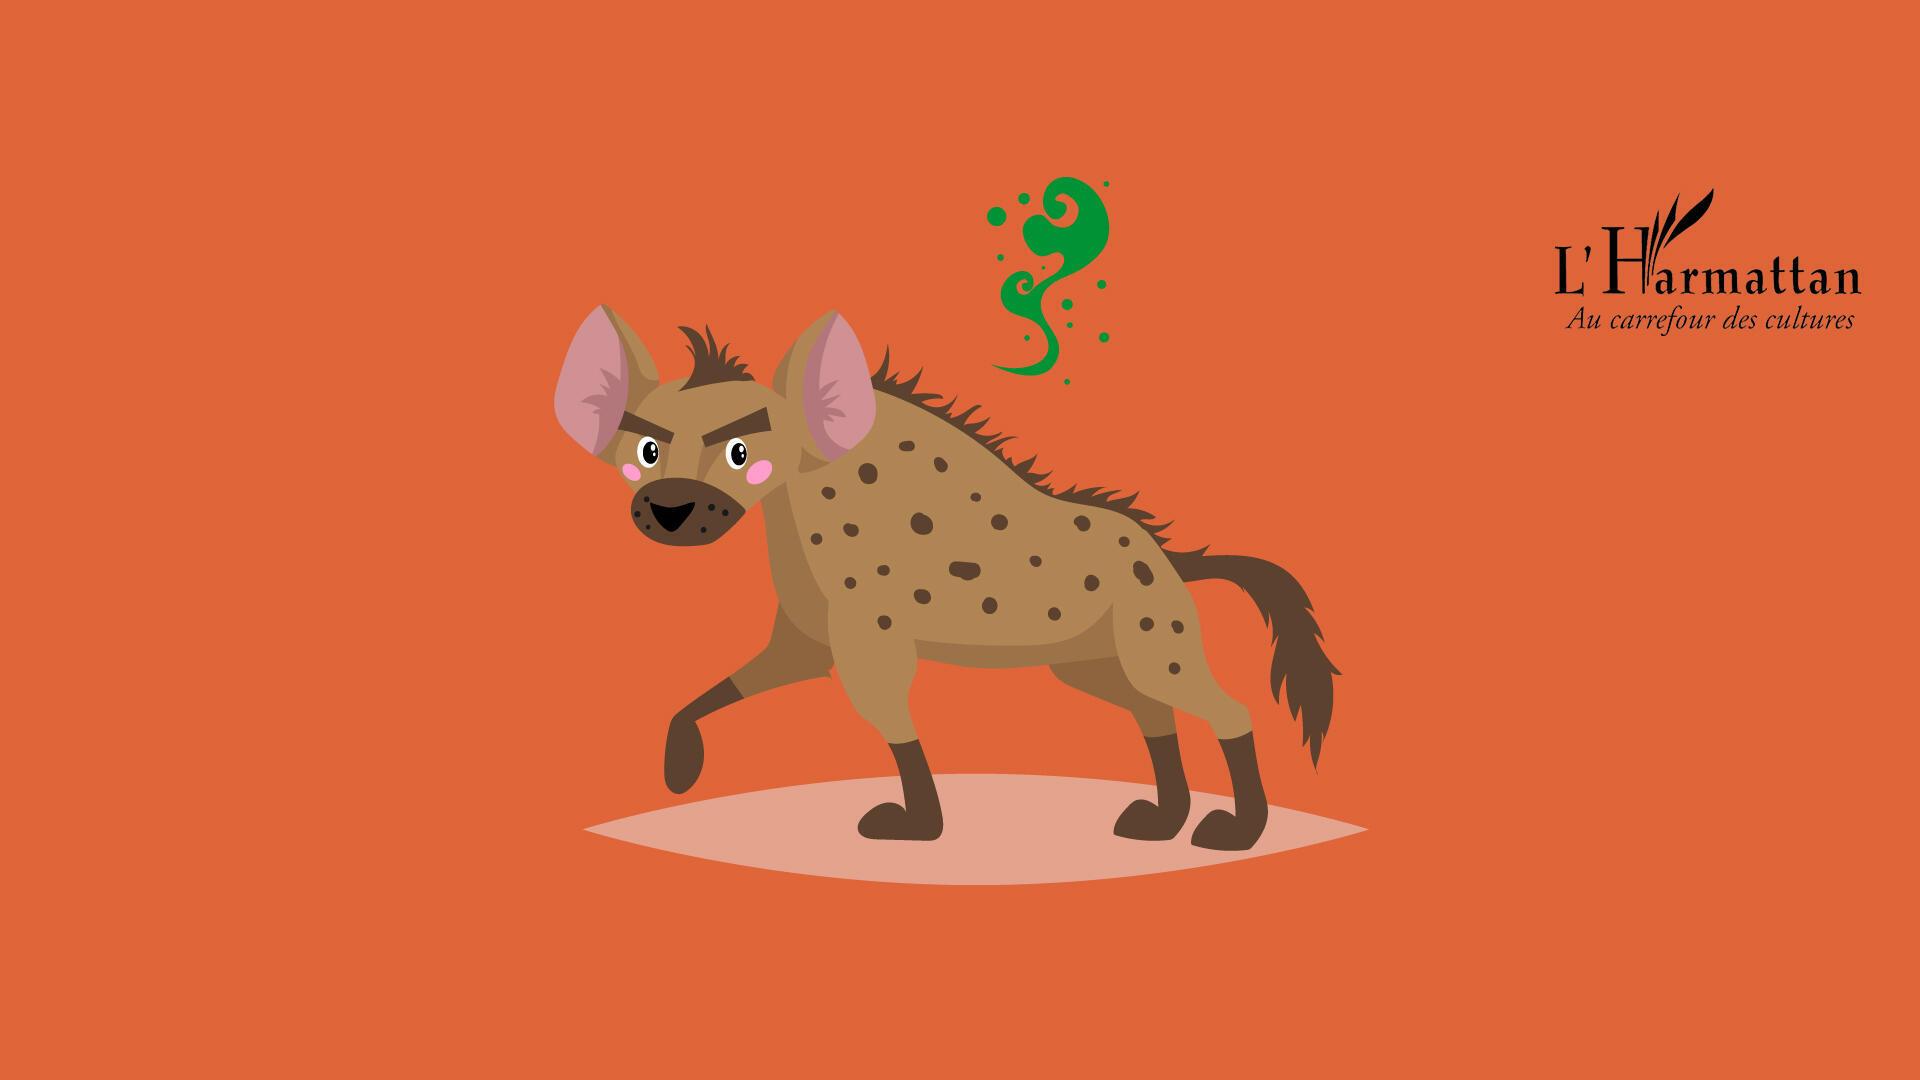 法广存档图片:鬣狗群体 女王为首Image d'archive RFI : Chez les hyènes, c'est la femelle qui domine. Ici, Hyène et le festin du roi